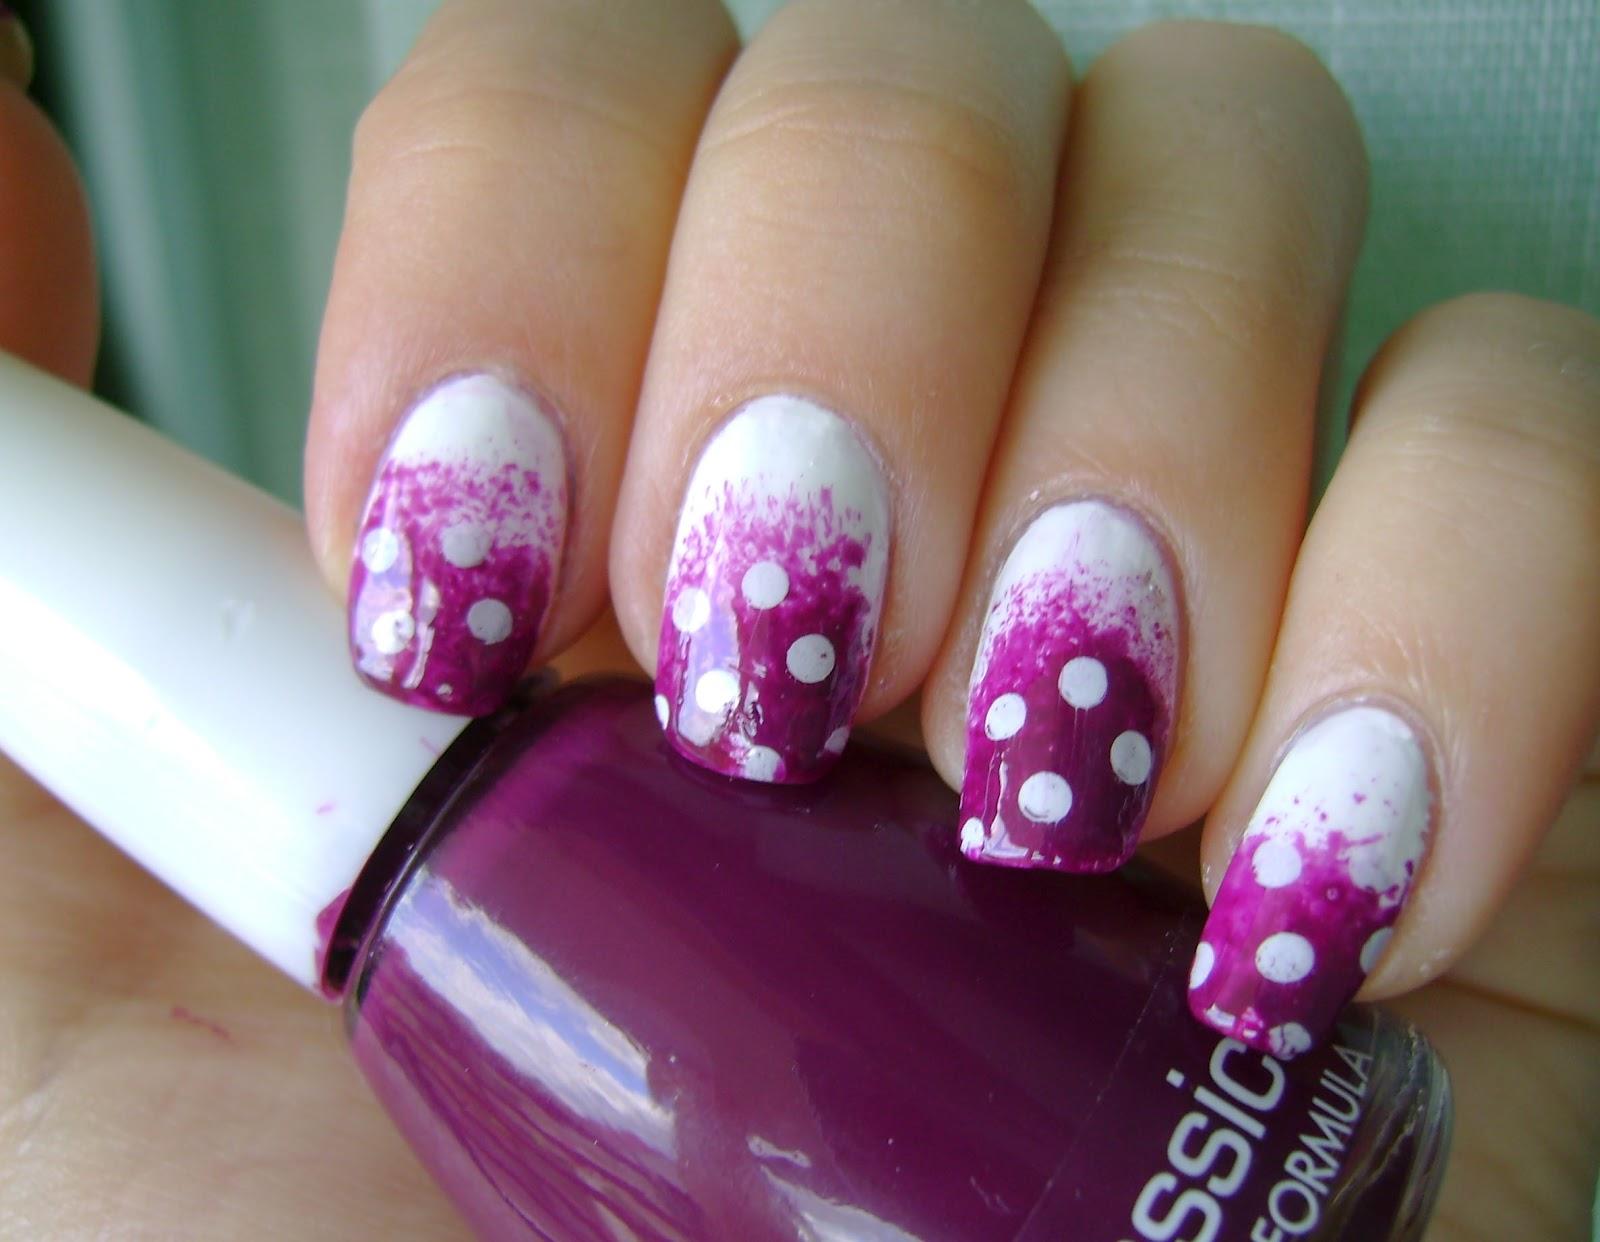 Acrylic Nail Art Designs Purple Polka Dot Manicure